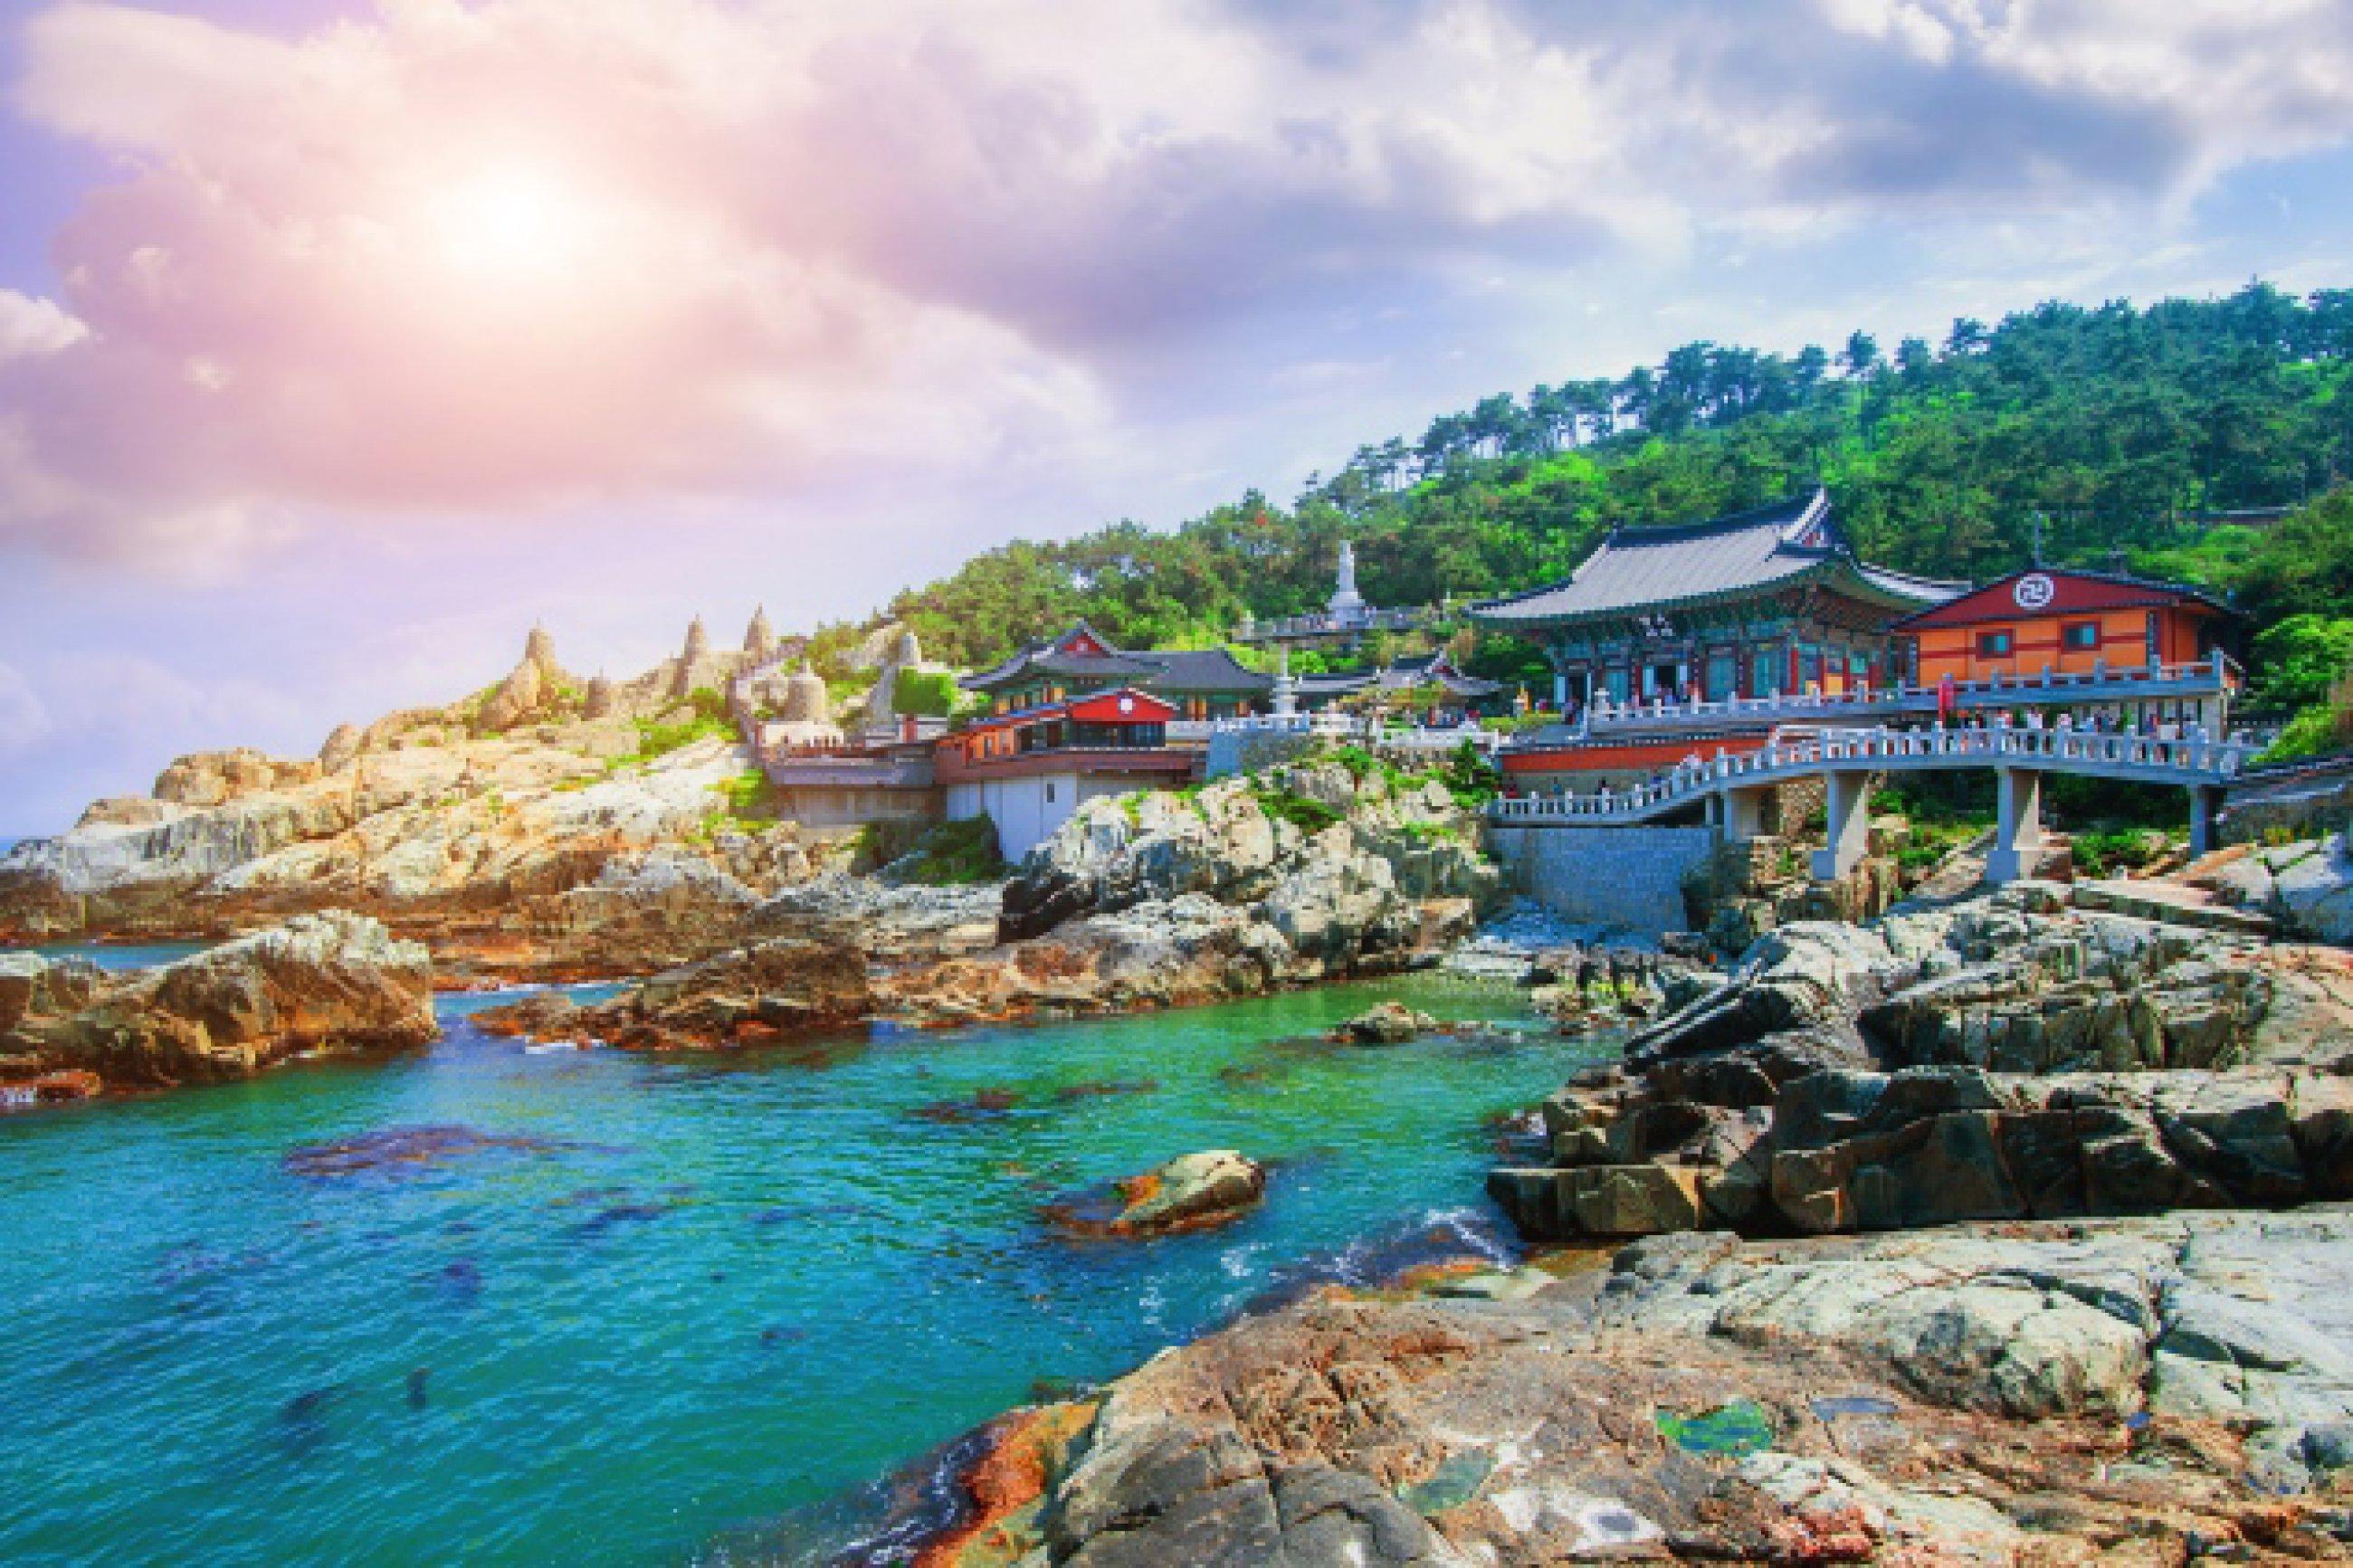 https://bubo.sk/uploads/galleries/7452/haedong-yonggungsa-temple-and-haeundae-sea-in-busan-south-korea.jpg